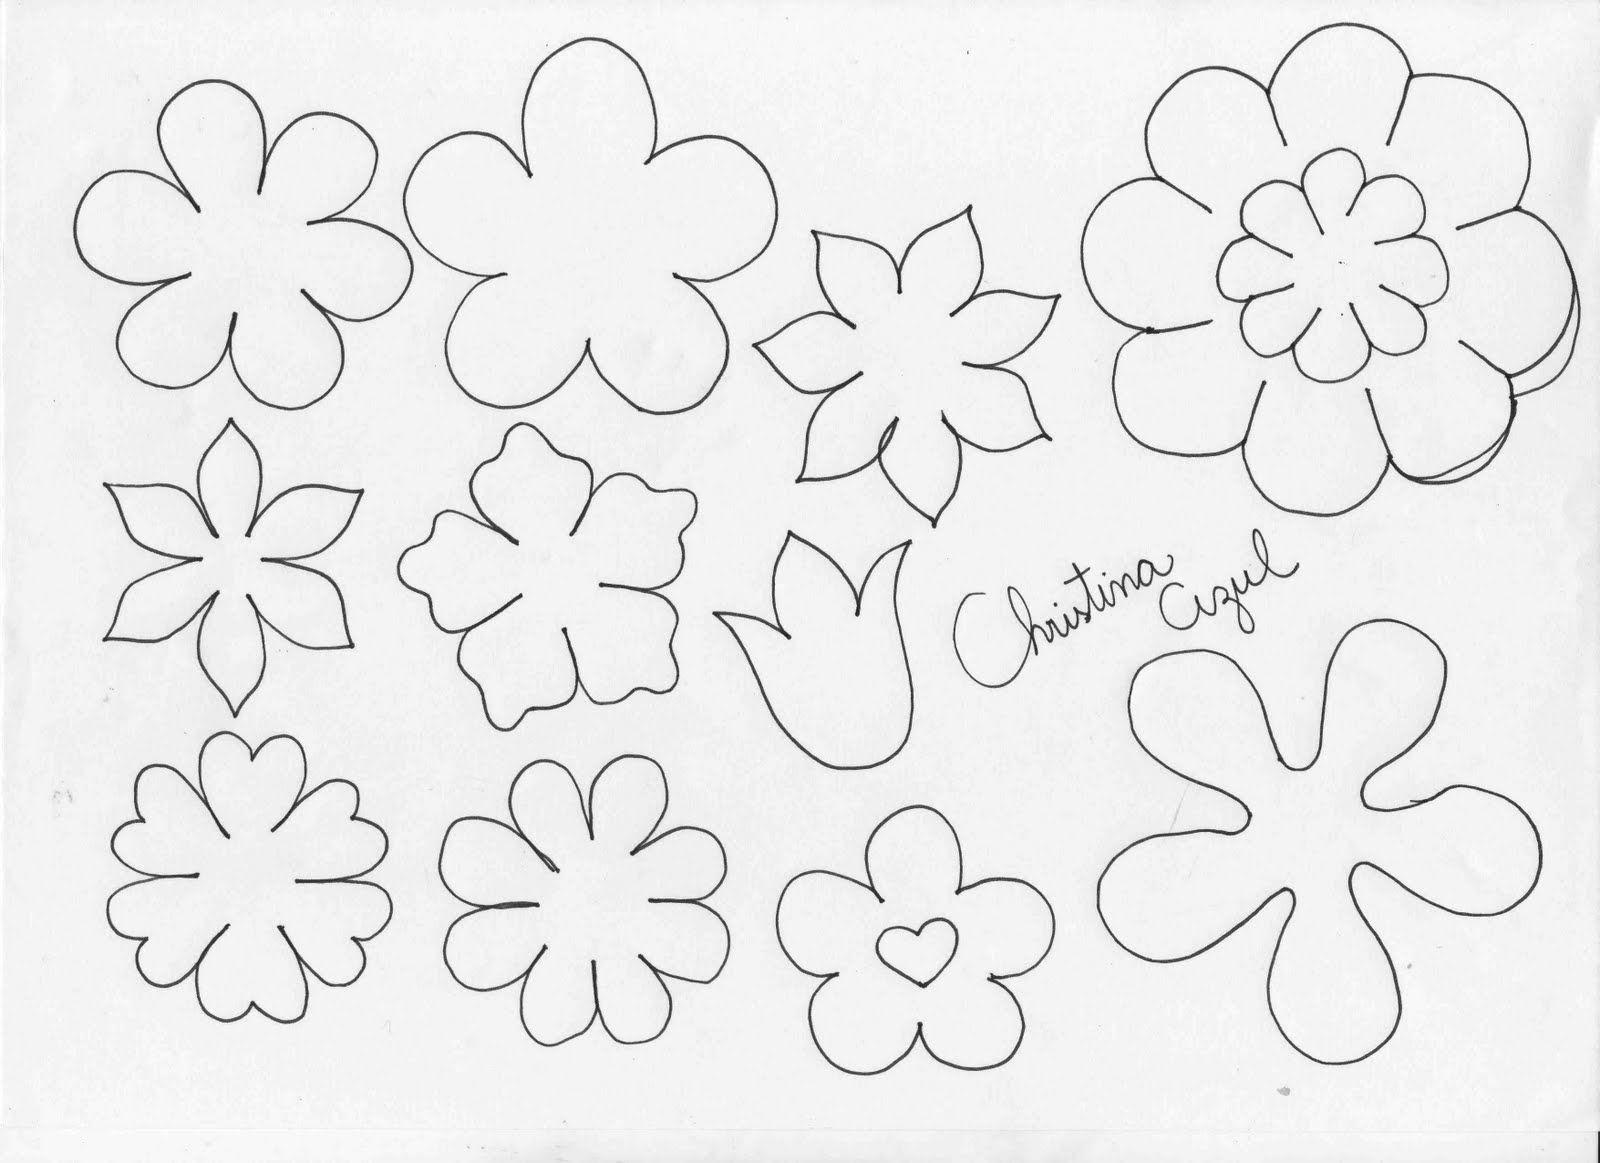 Moldes de flores variadas para imprimir | Fotos o Imágenes ...